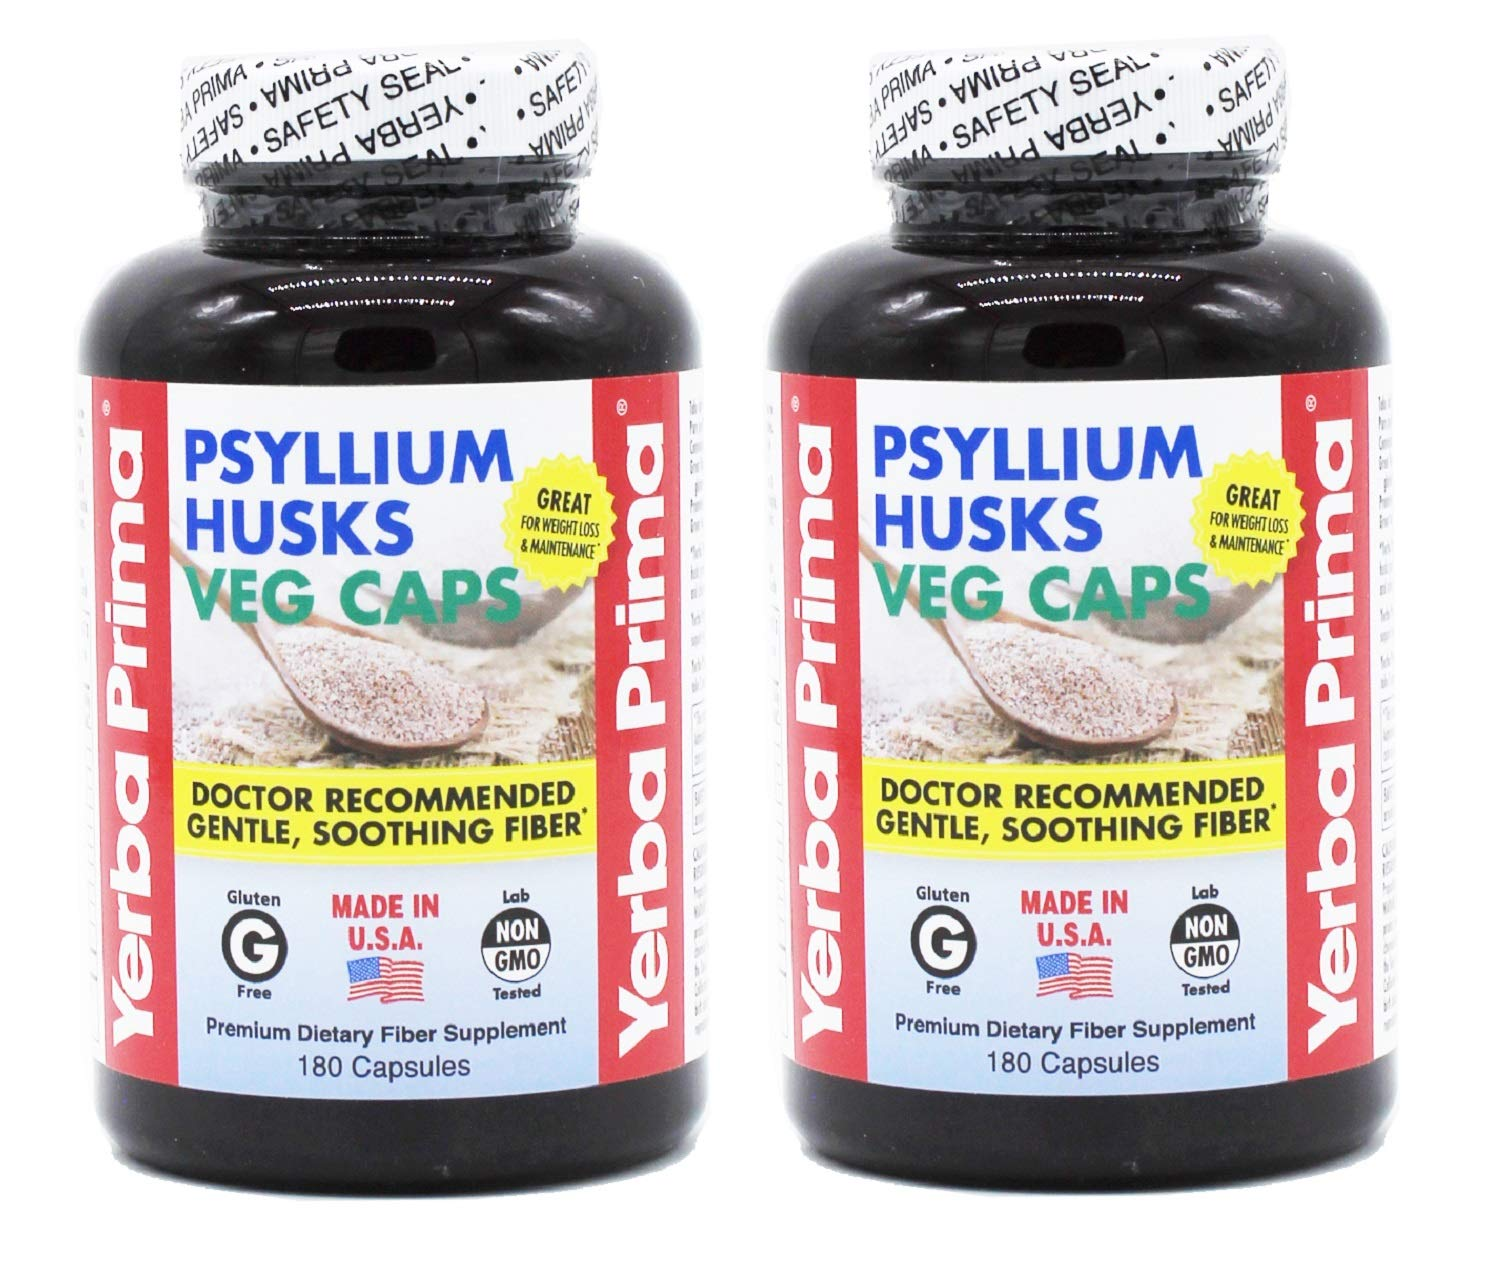 Yerba Prima Psyllium Husk Veg Caps for Regularity & Heart Health, 180 Capsules (Pack of 2)